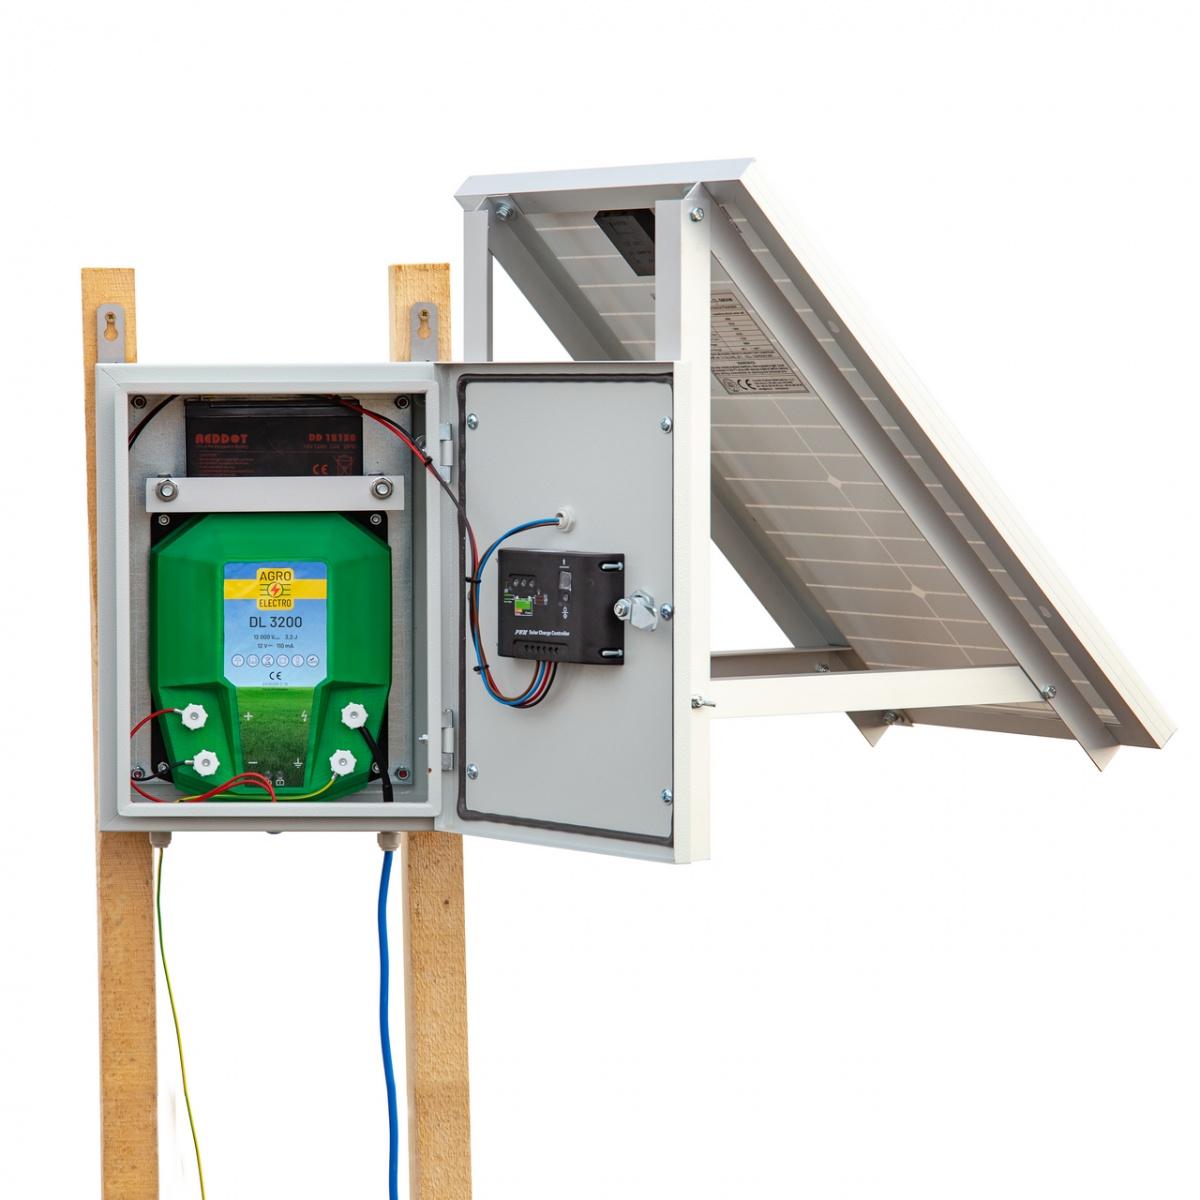 Aparat gard electric compact DL3200 cu sistem solar 30W și acumulator 12V